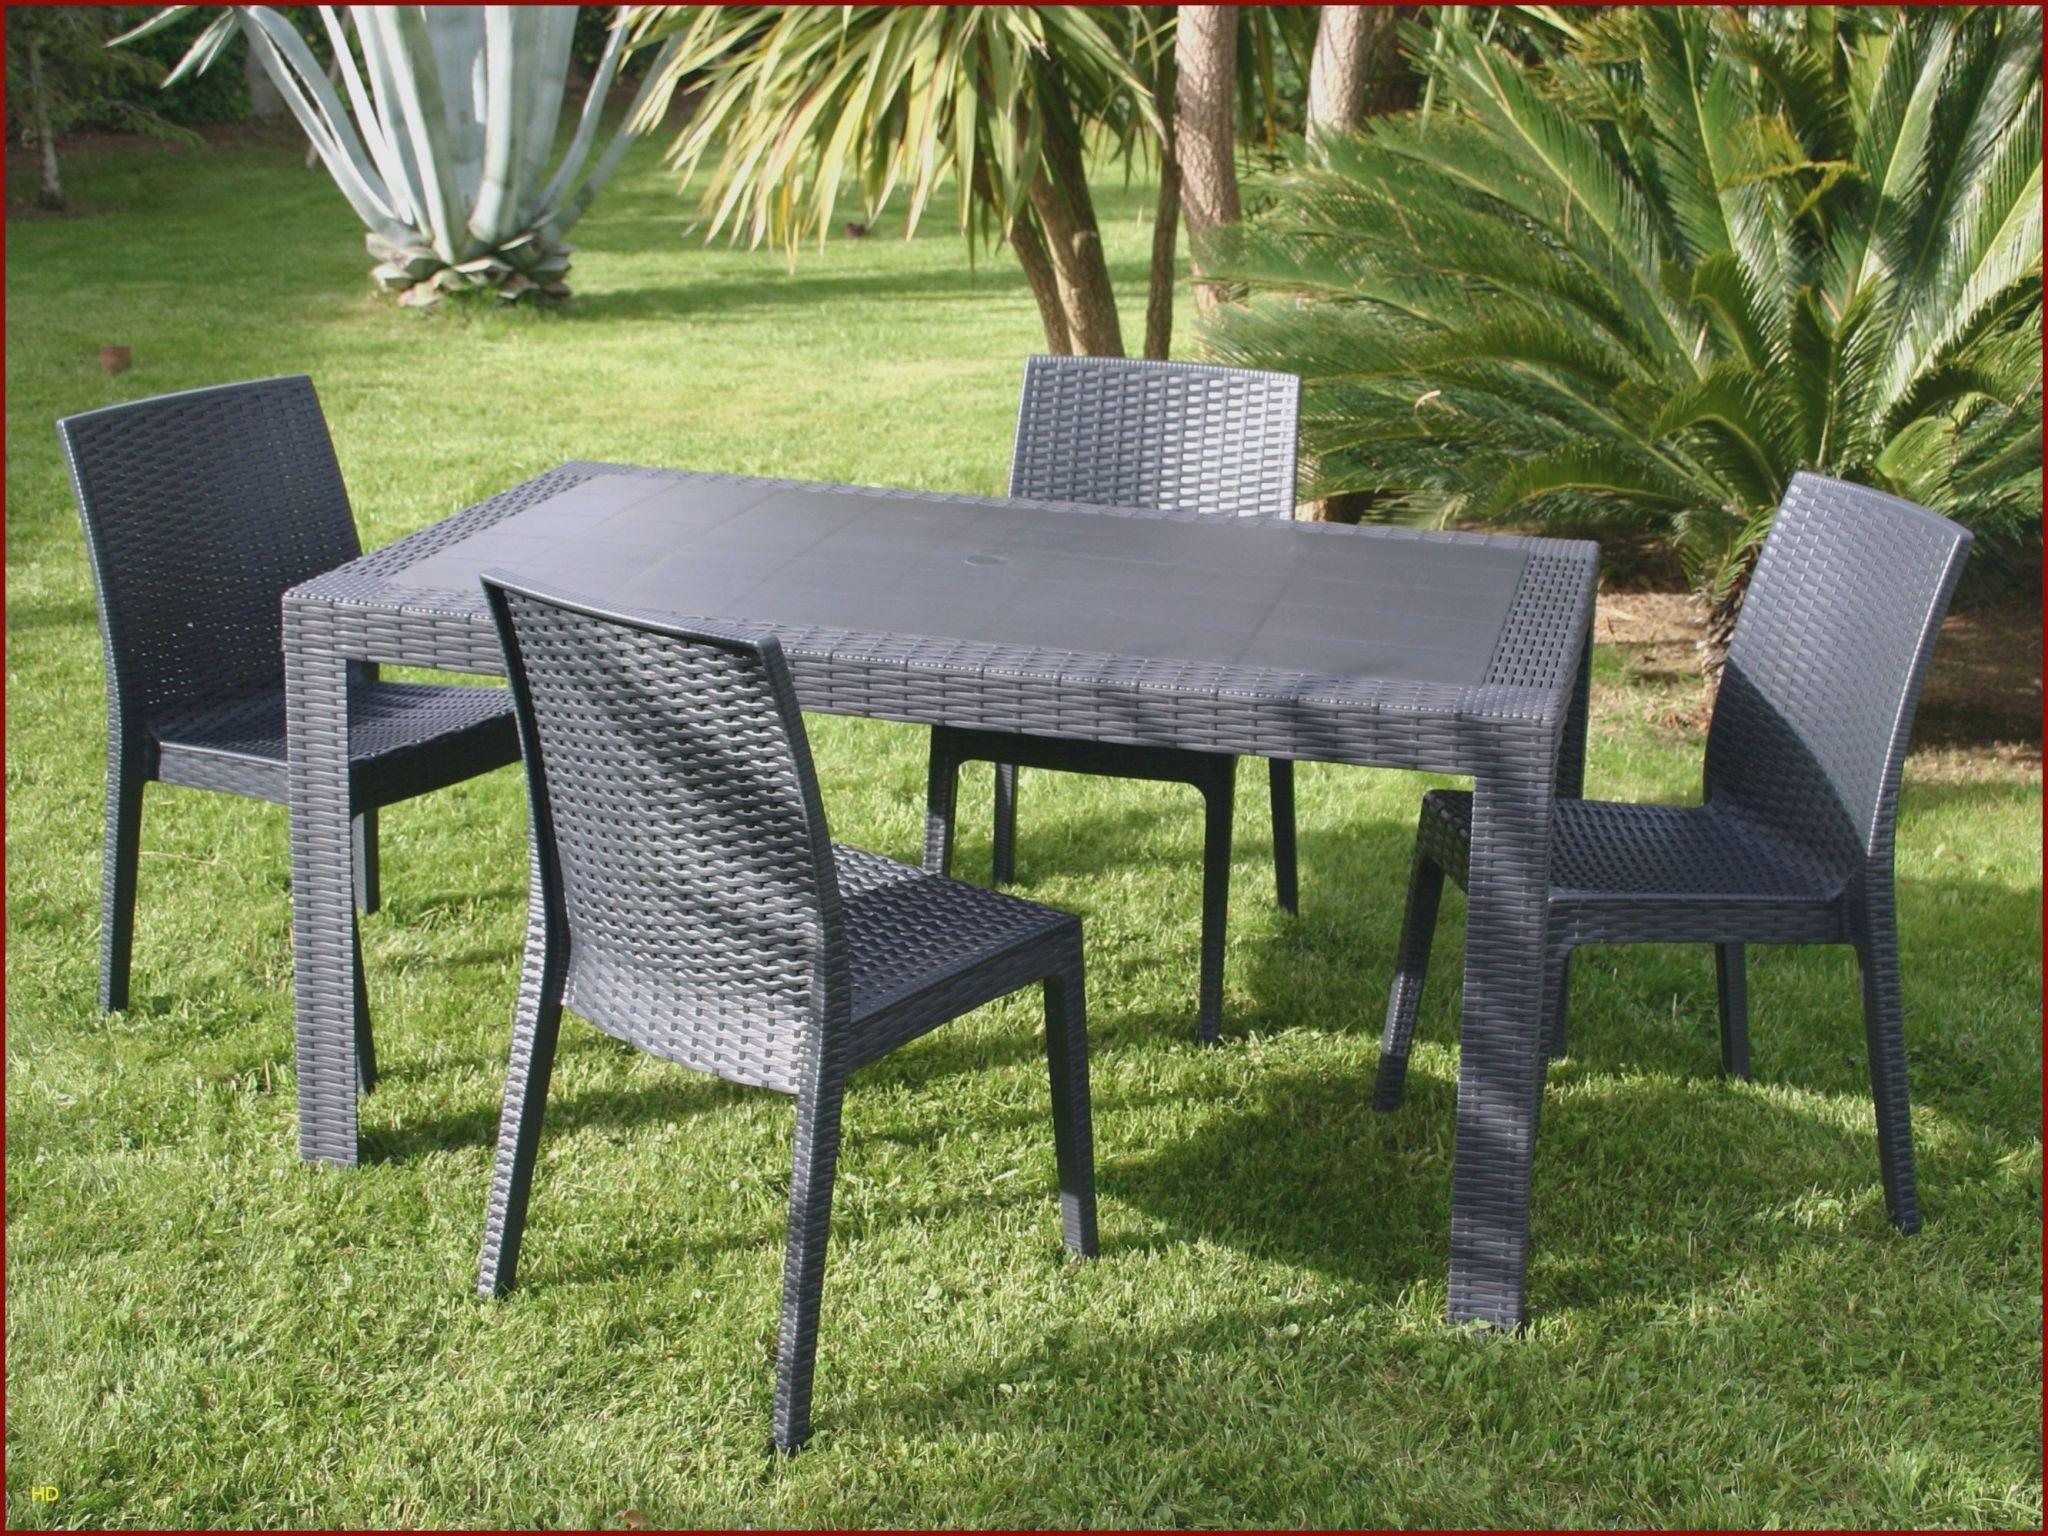 Table Exterieur Bois Frais Chaises Luxe Chaise Ice 0d Table Jardin Resine Lovely